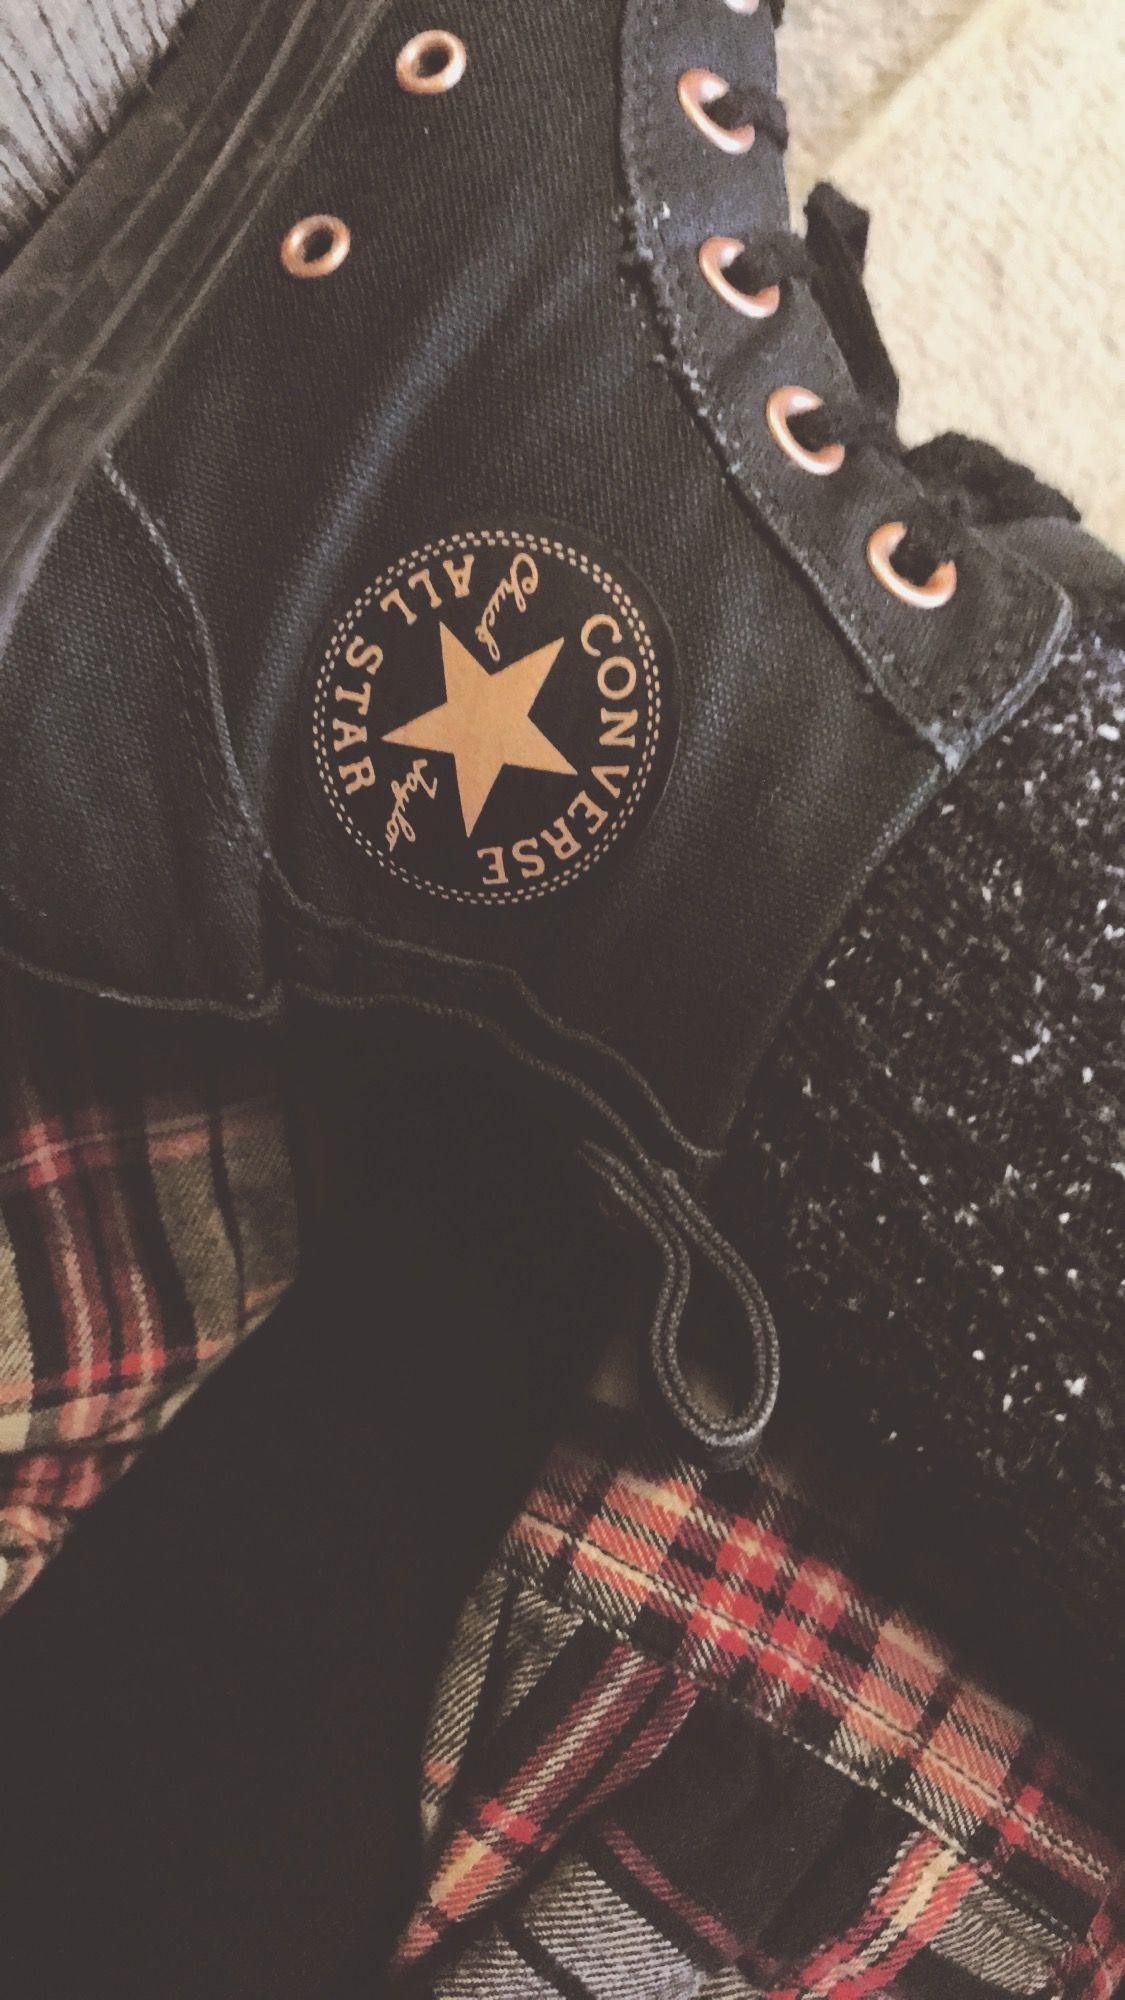 Grunge hipster aesthetic converse plaid   Vêtements